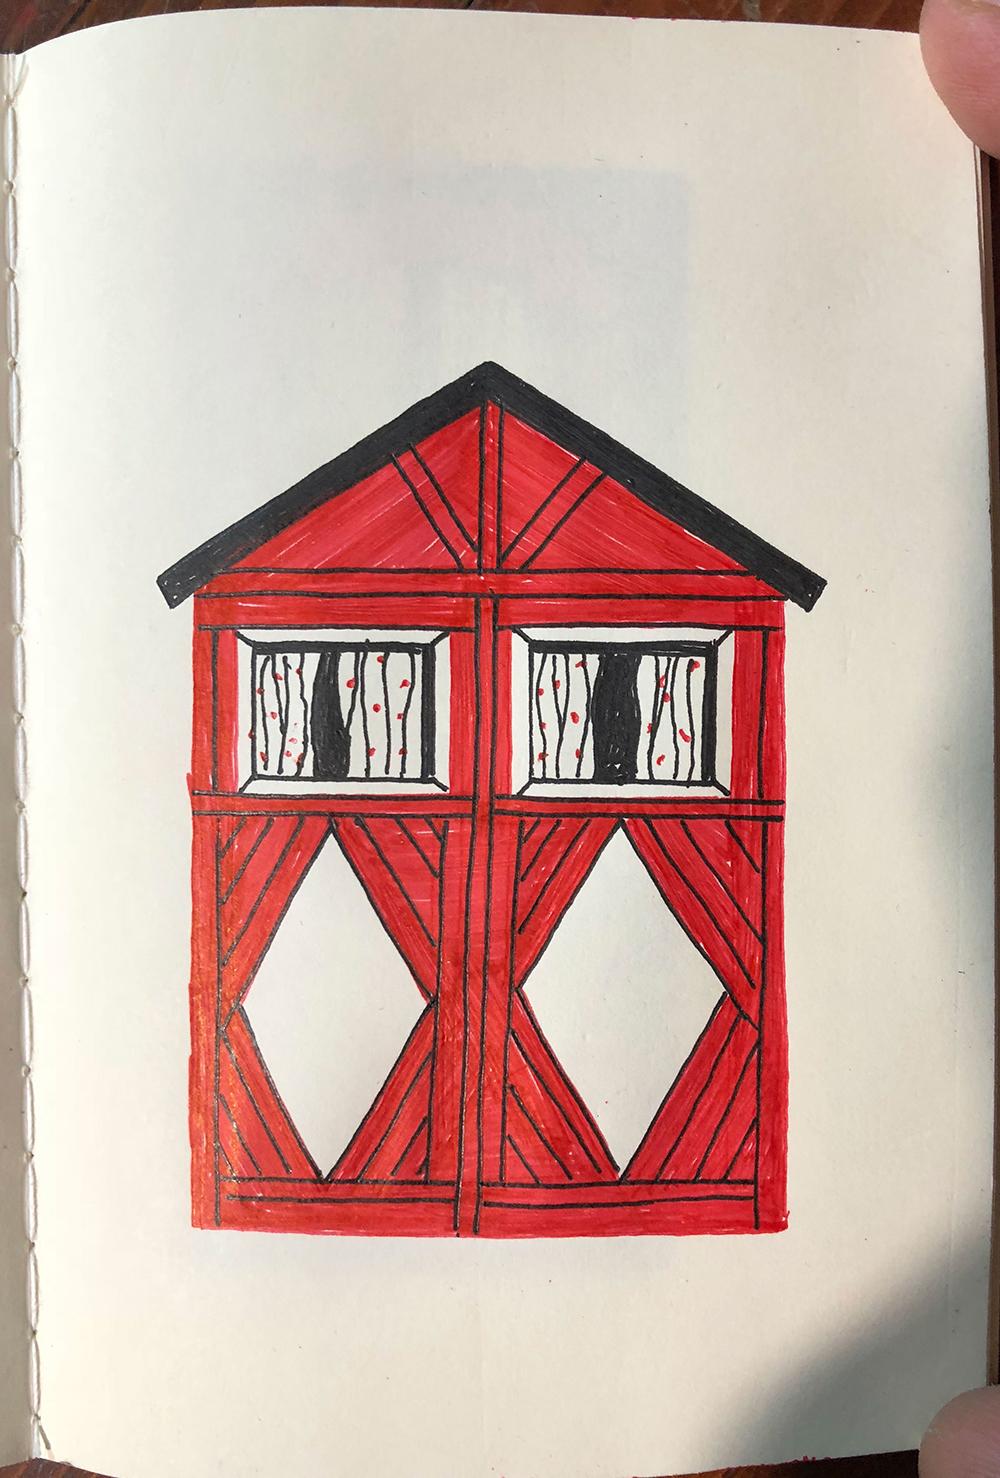 tom-gerrard-bench-talk-daily drawing-5.jpg